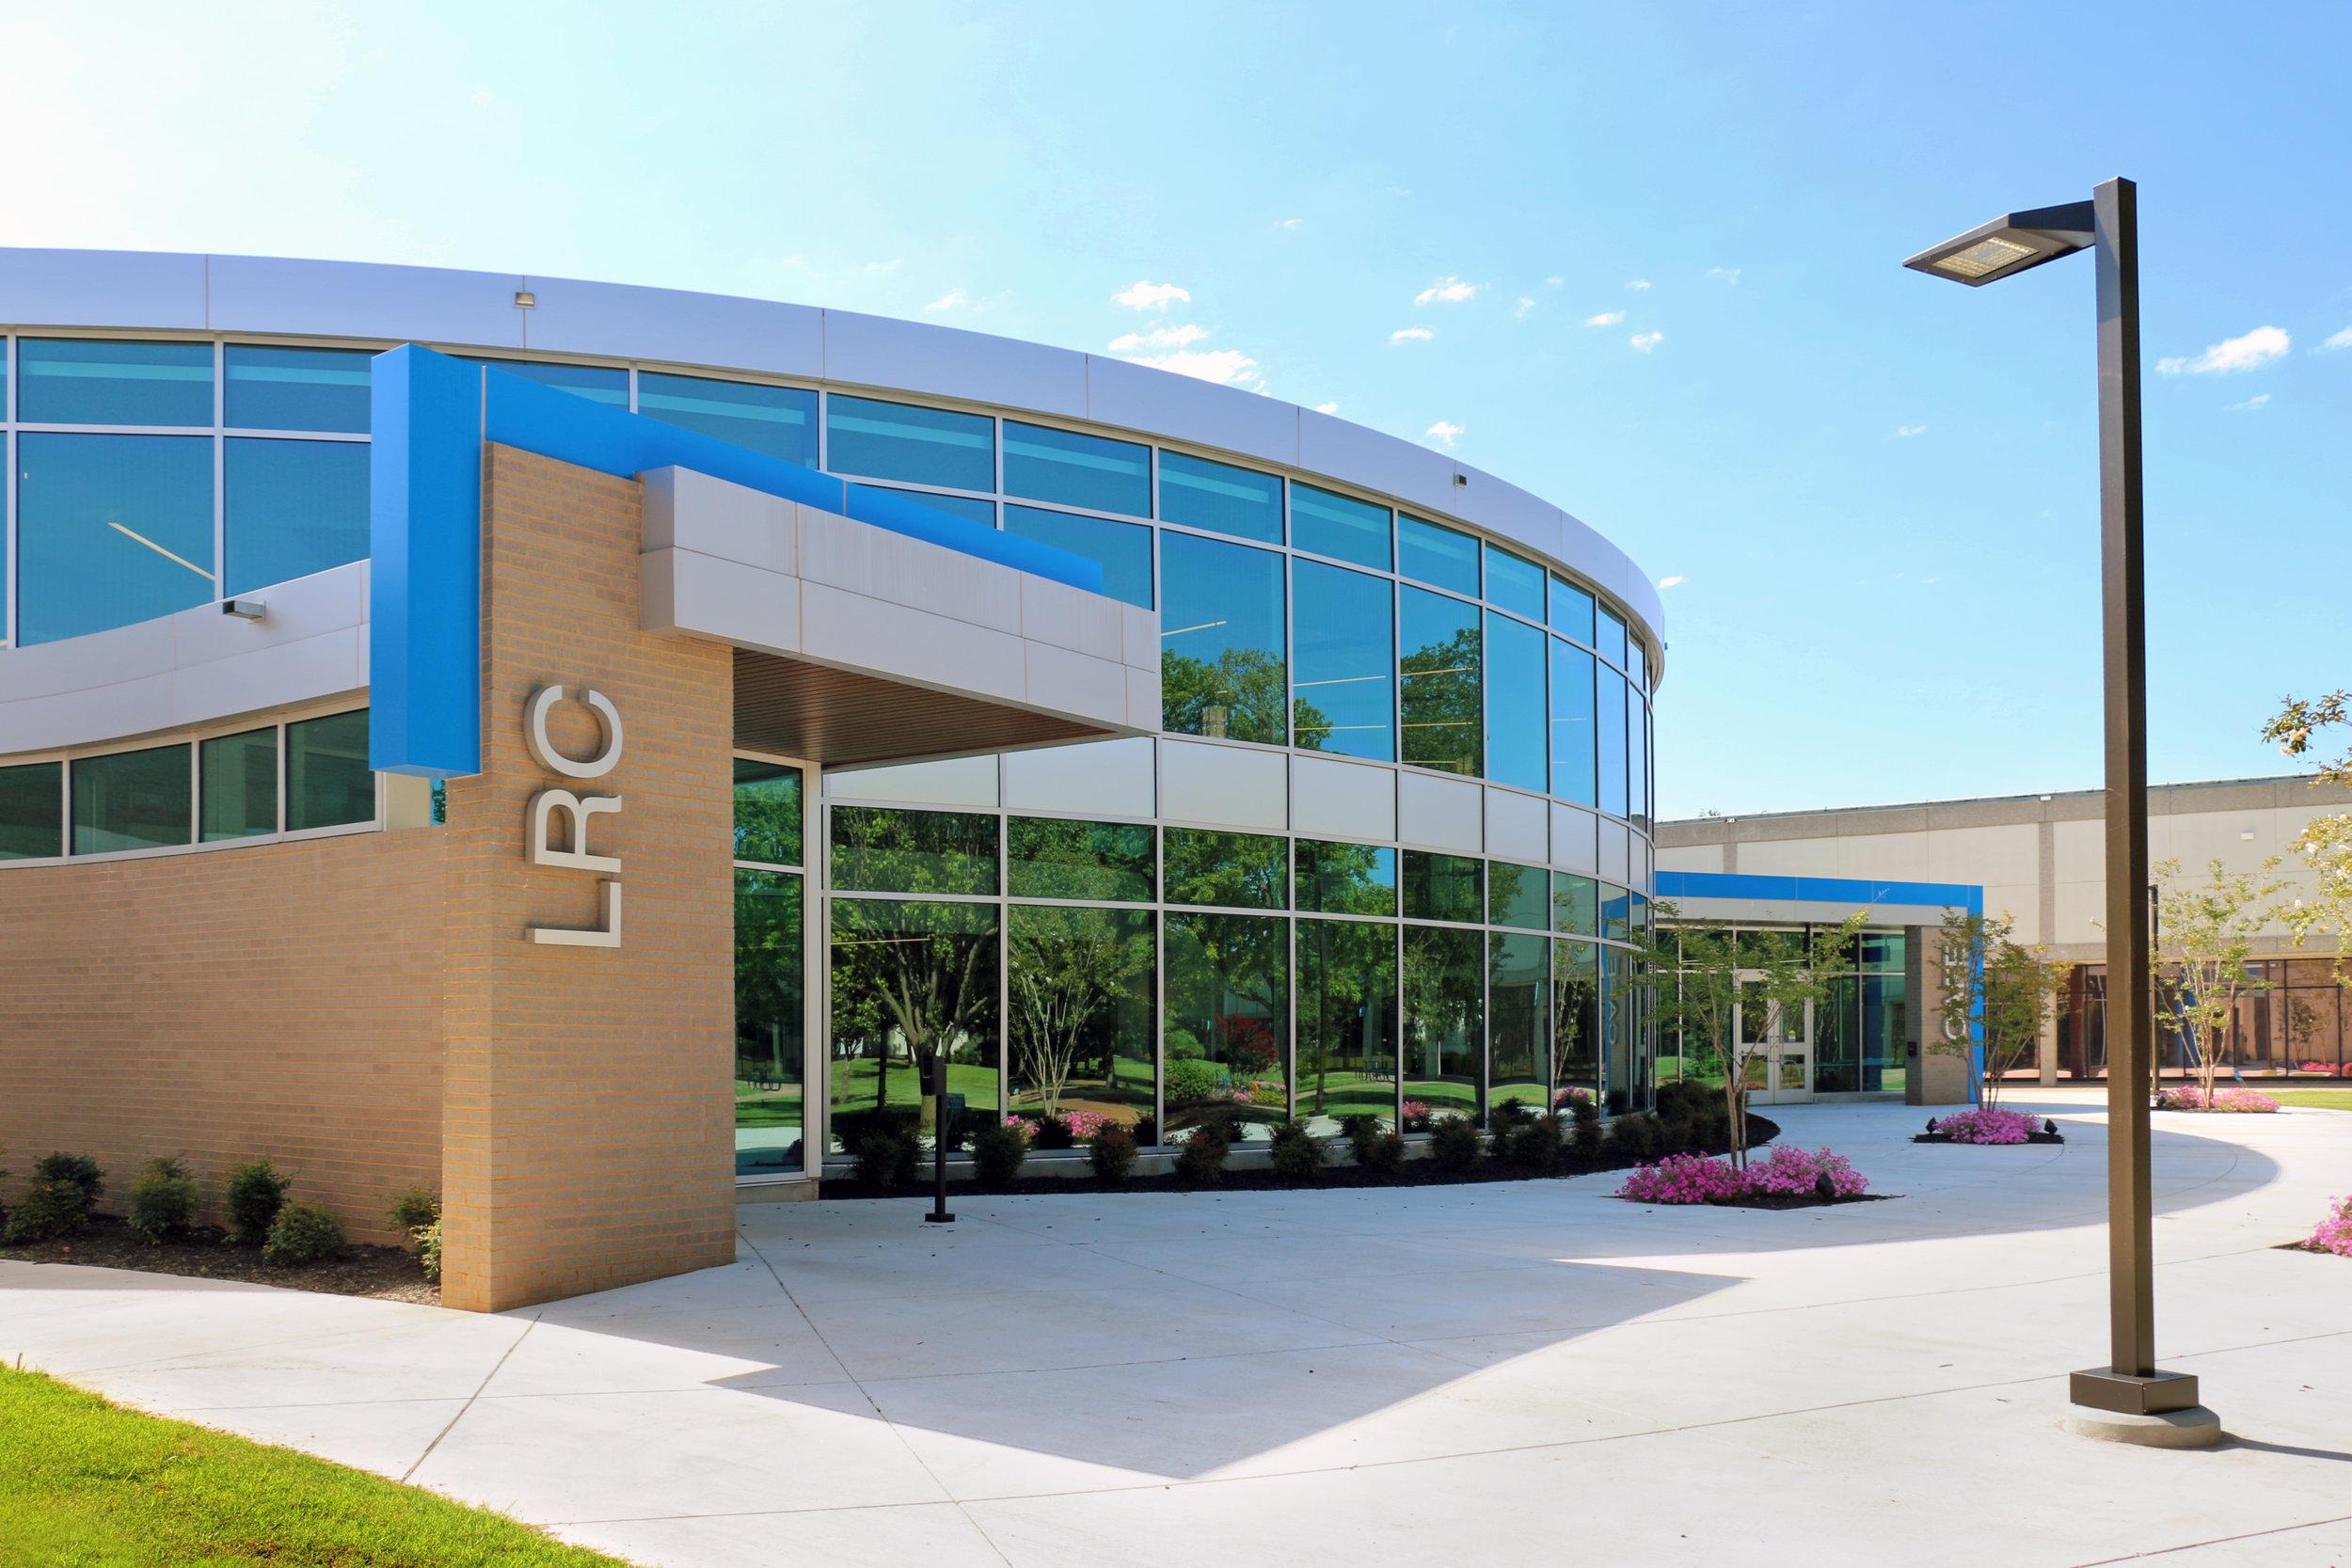 Rose State College_LRC_01.jpg